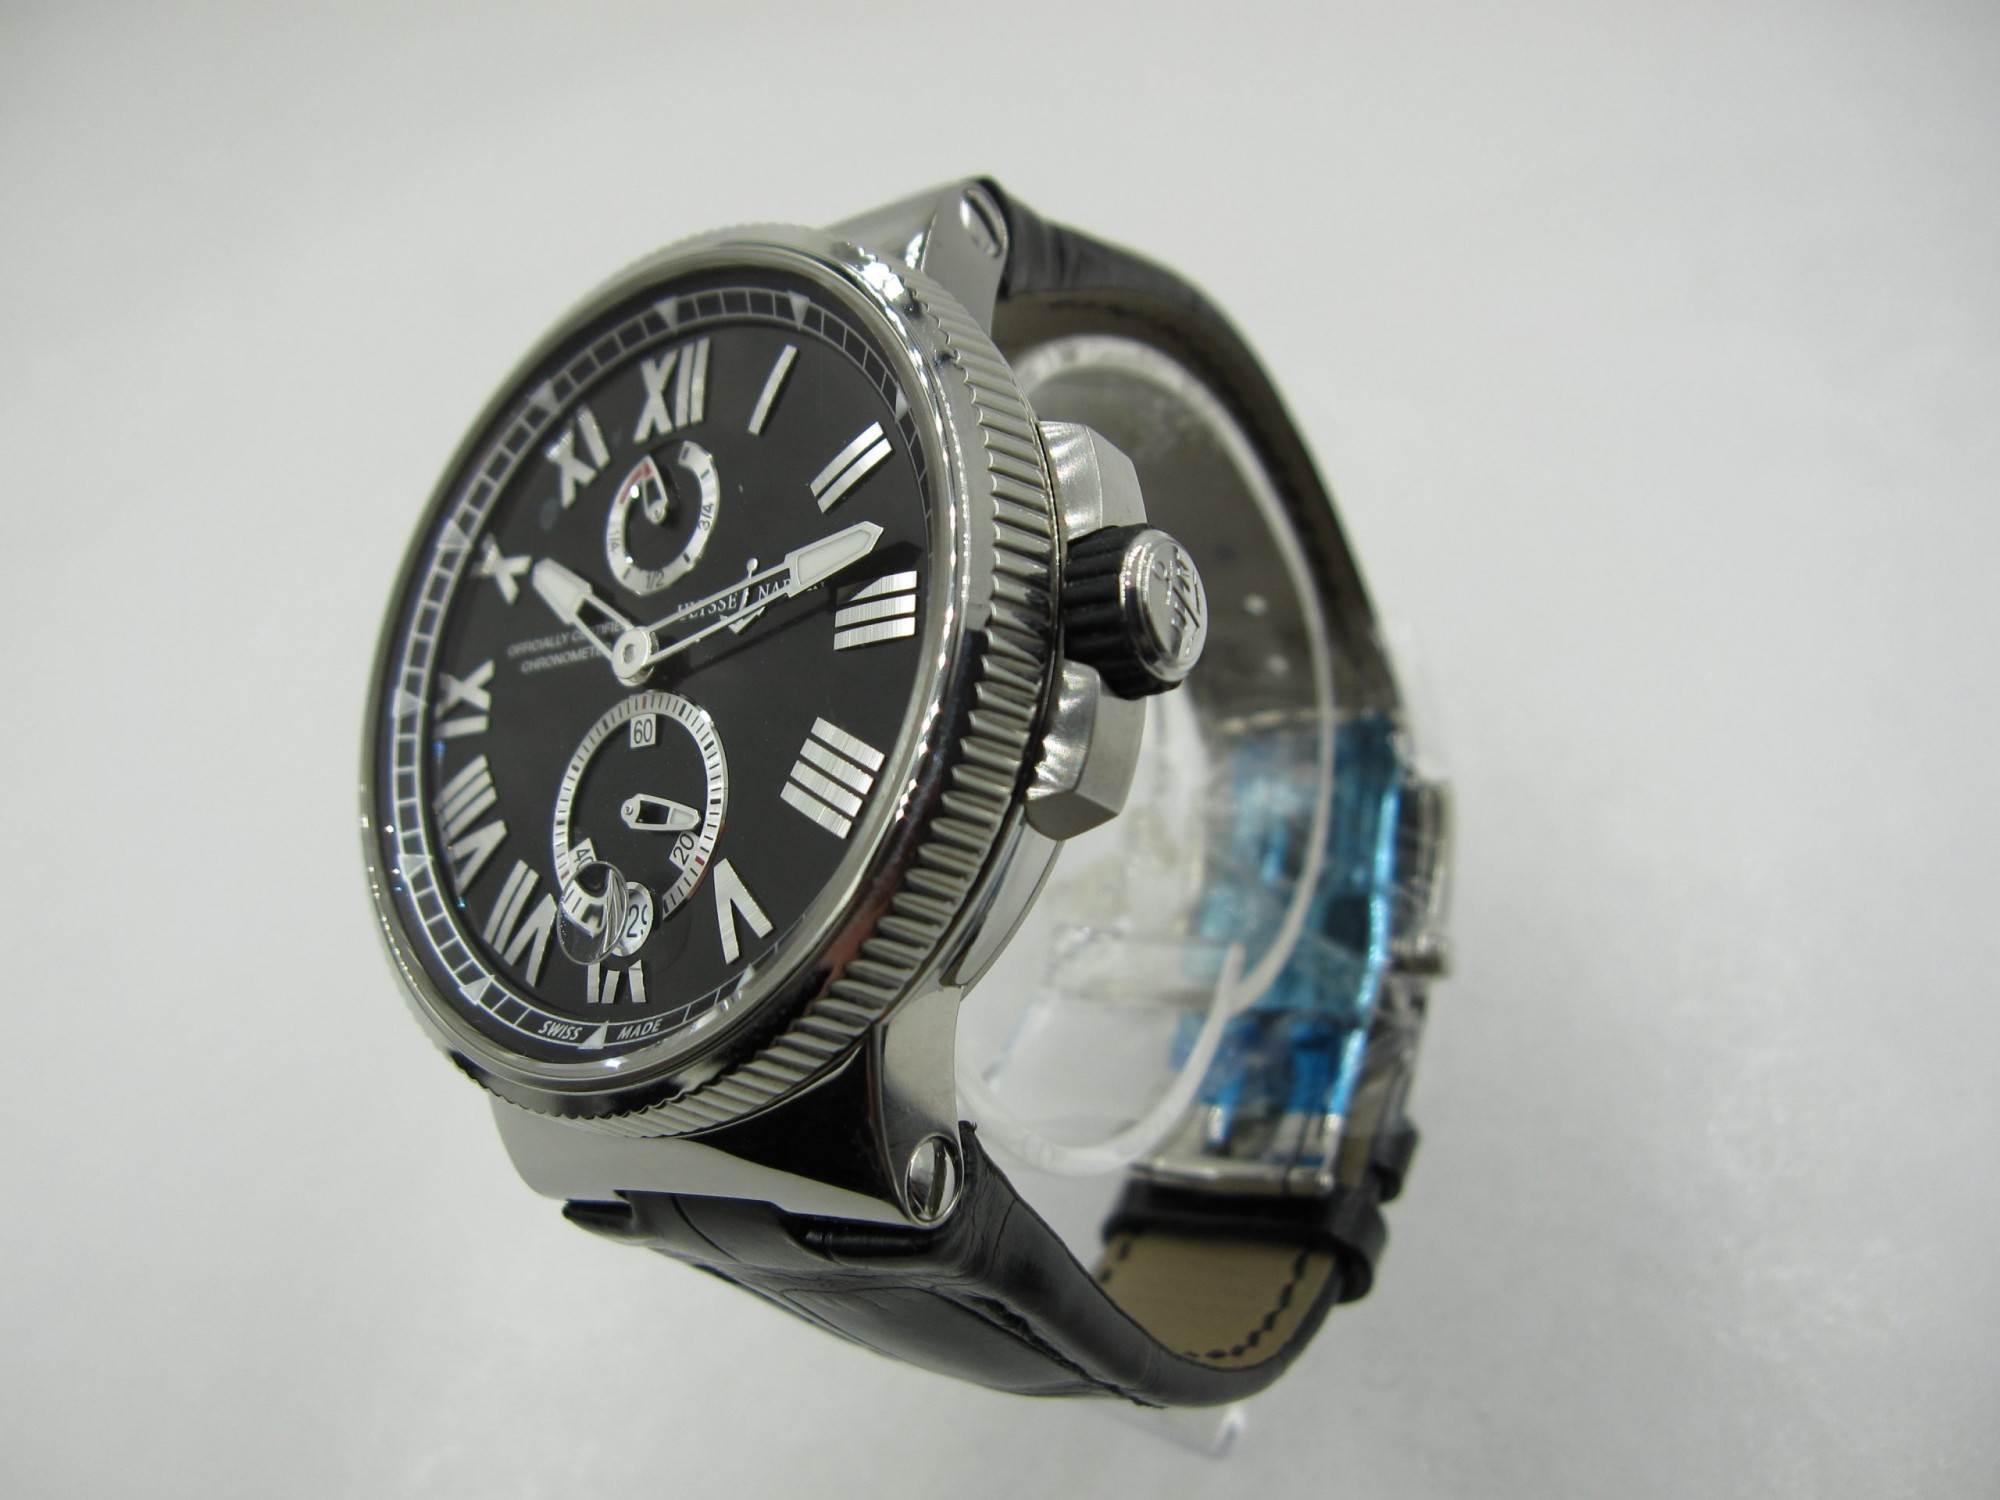 Ulysse Nardin 263-67 Maxi Marine Chronometer(Unworn) UN-002